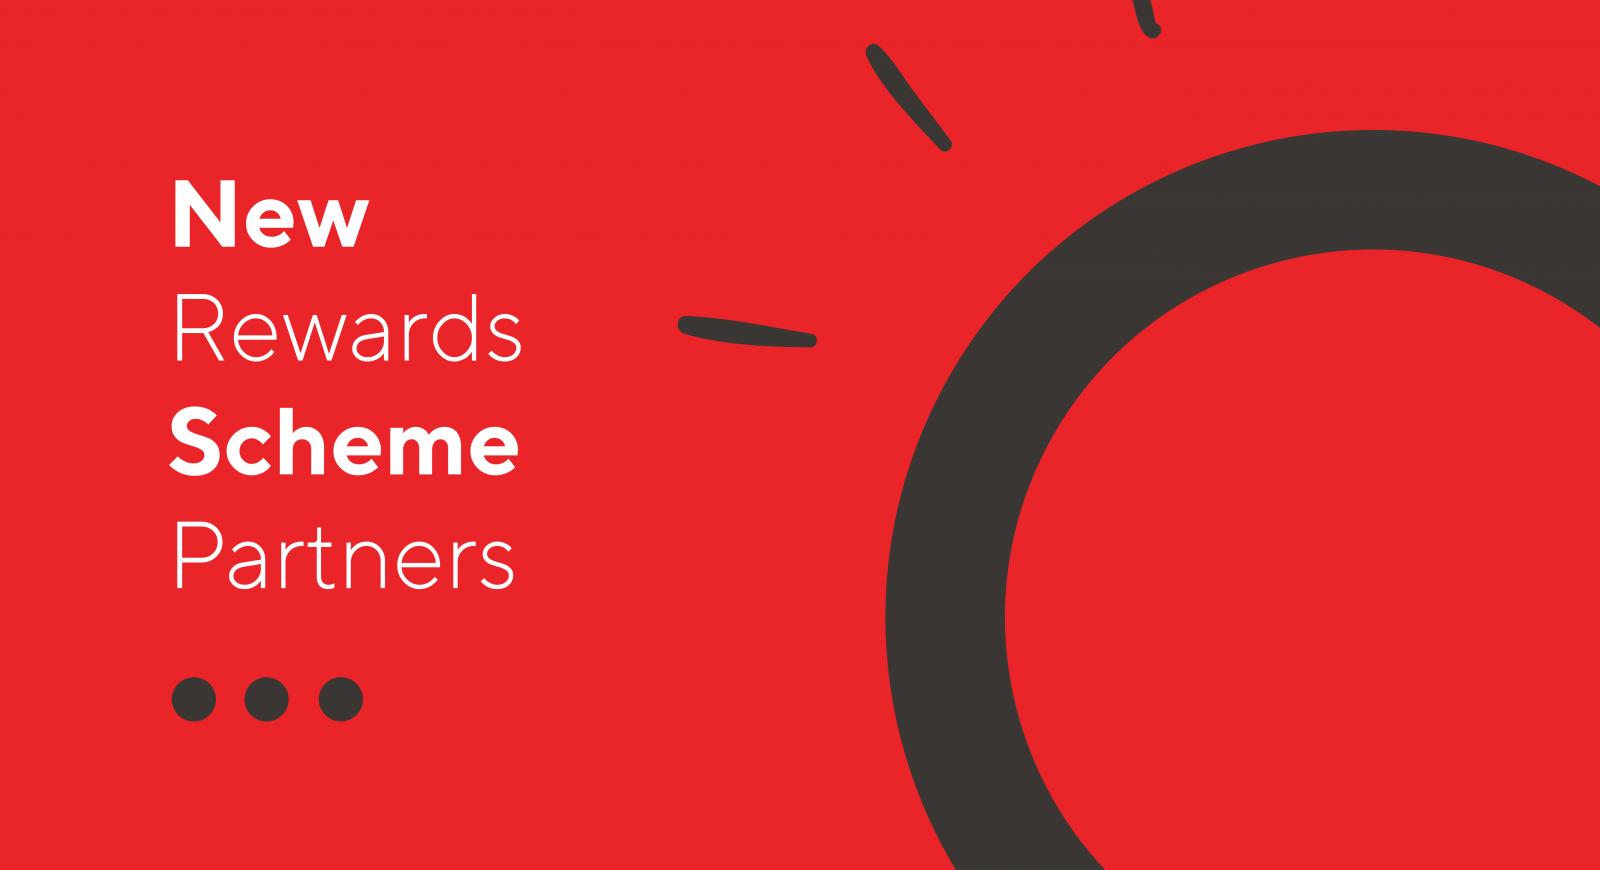 New rewards scheme partners on board